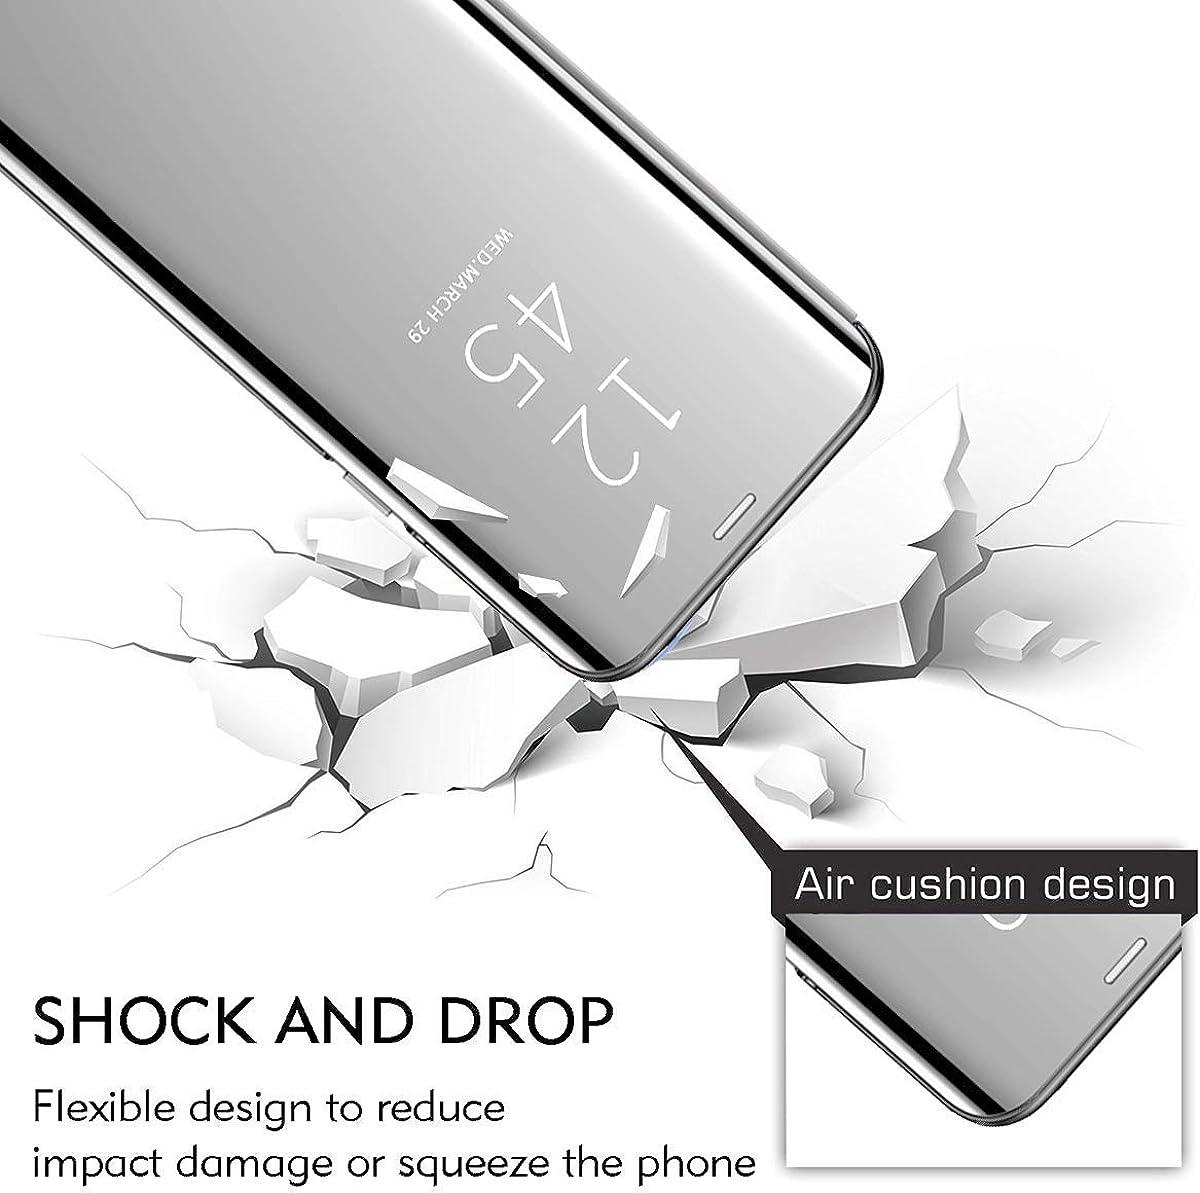 H/ülle Kompatibel mit Huawei P smart 2019 Handyh/ülle,Spiegel PU Leder Flip H/ülle Clear View Mirror St/änder Cover 360 Grad Schutz PC Schutzh/ülle f/ür Huawei P smart Plus 2019